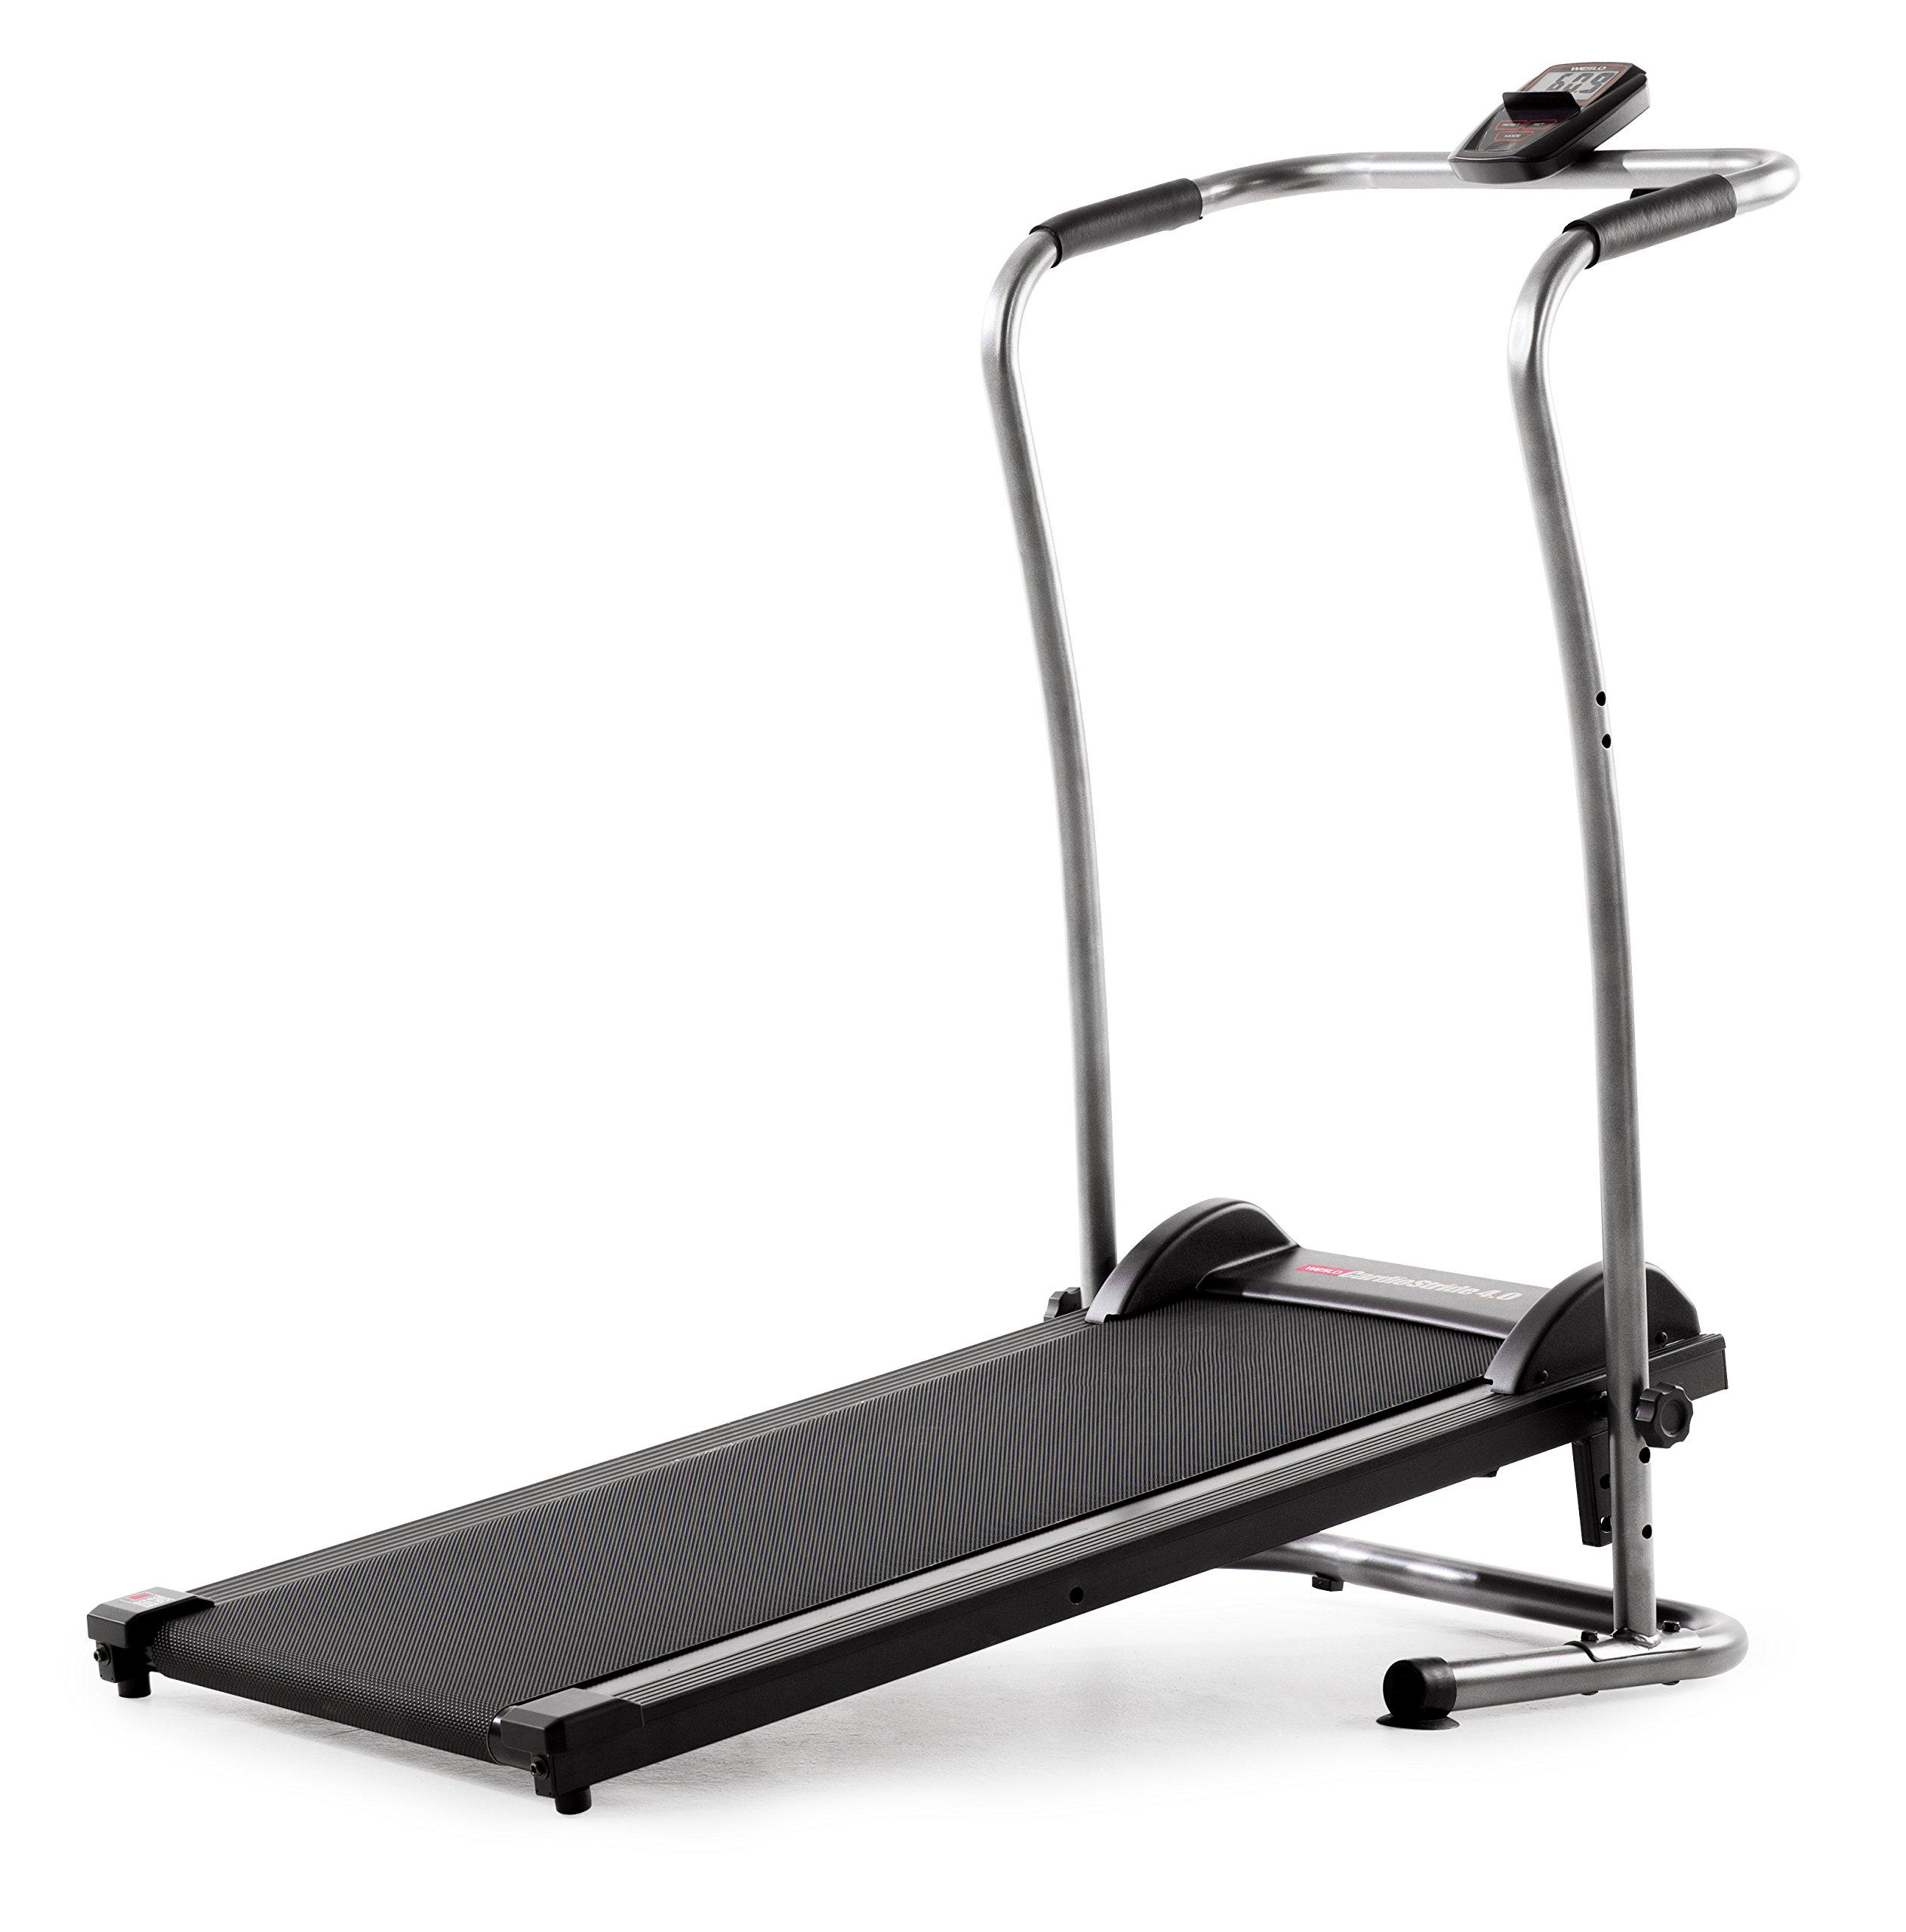 Weslo WLTL99616 Cardiostride 4.0 Treadmill, Black by Weslo